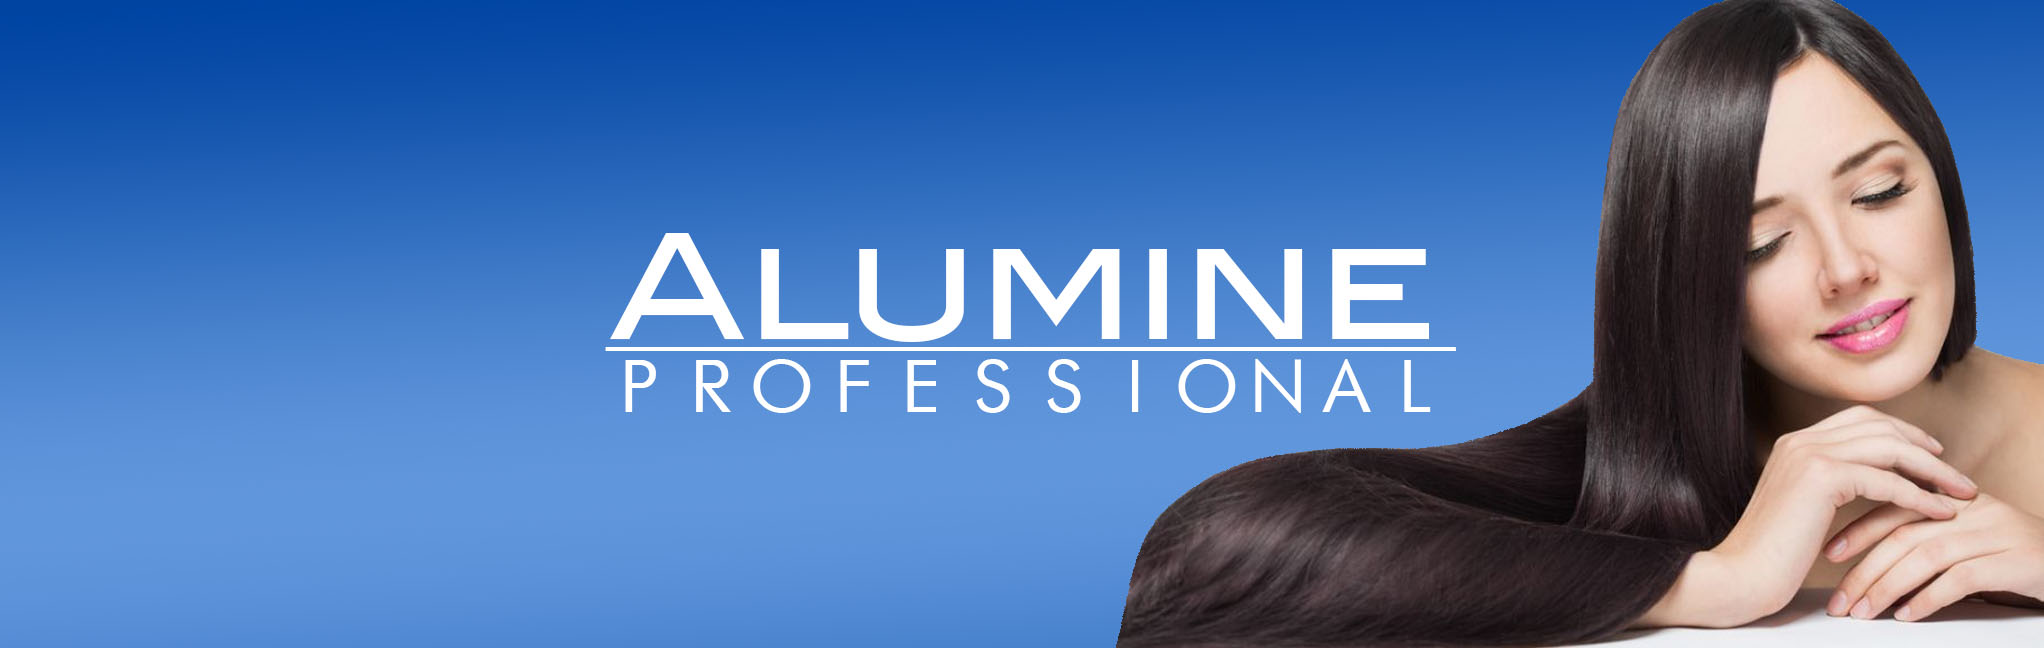 Alumine Professional